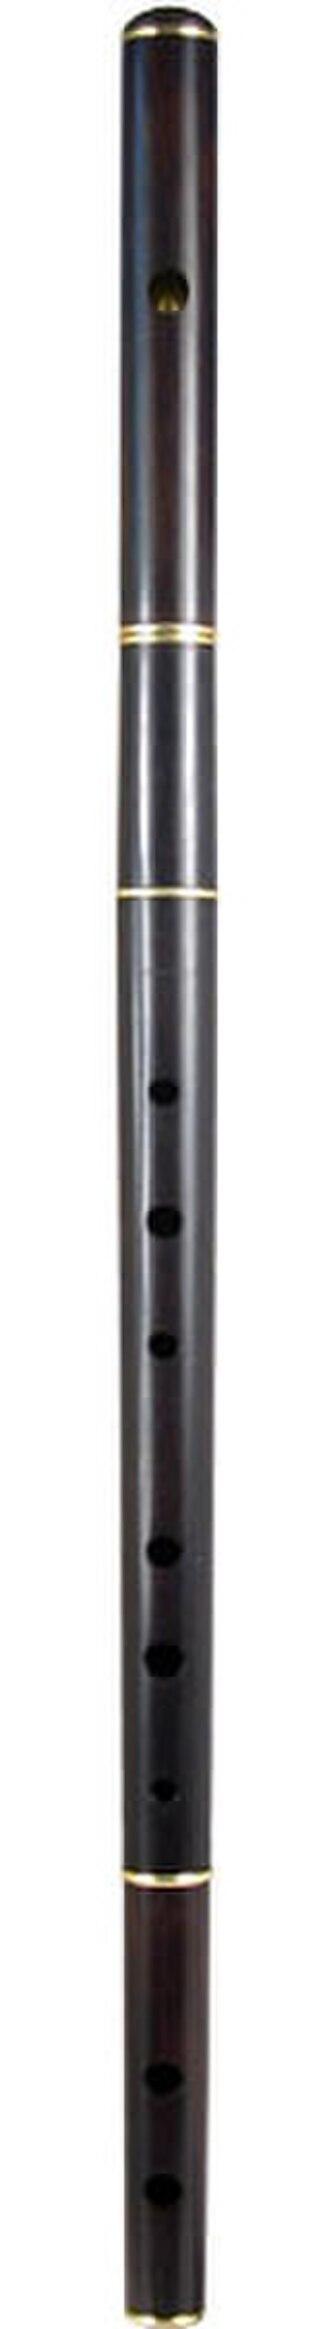 Irish flute - A (keyless) wooden flute